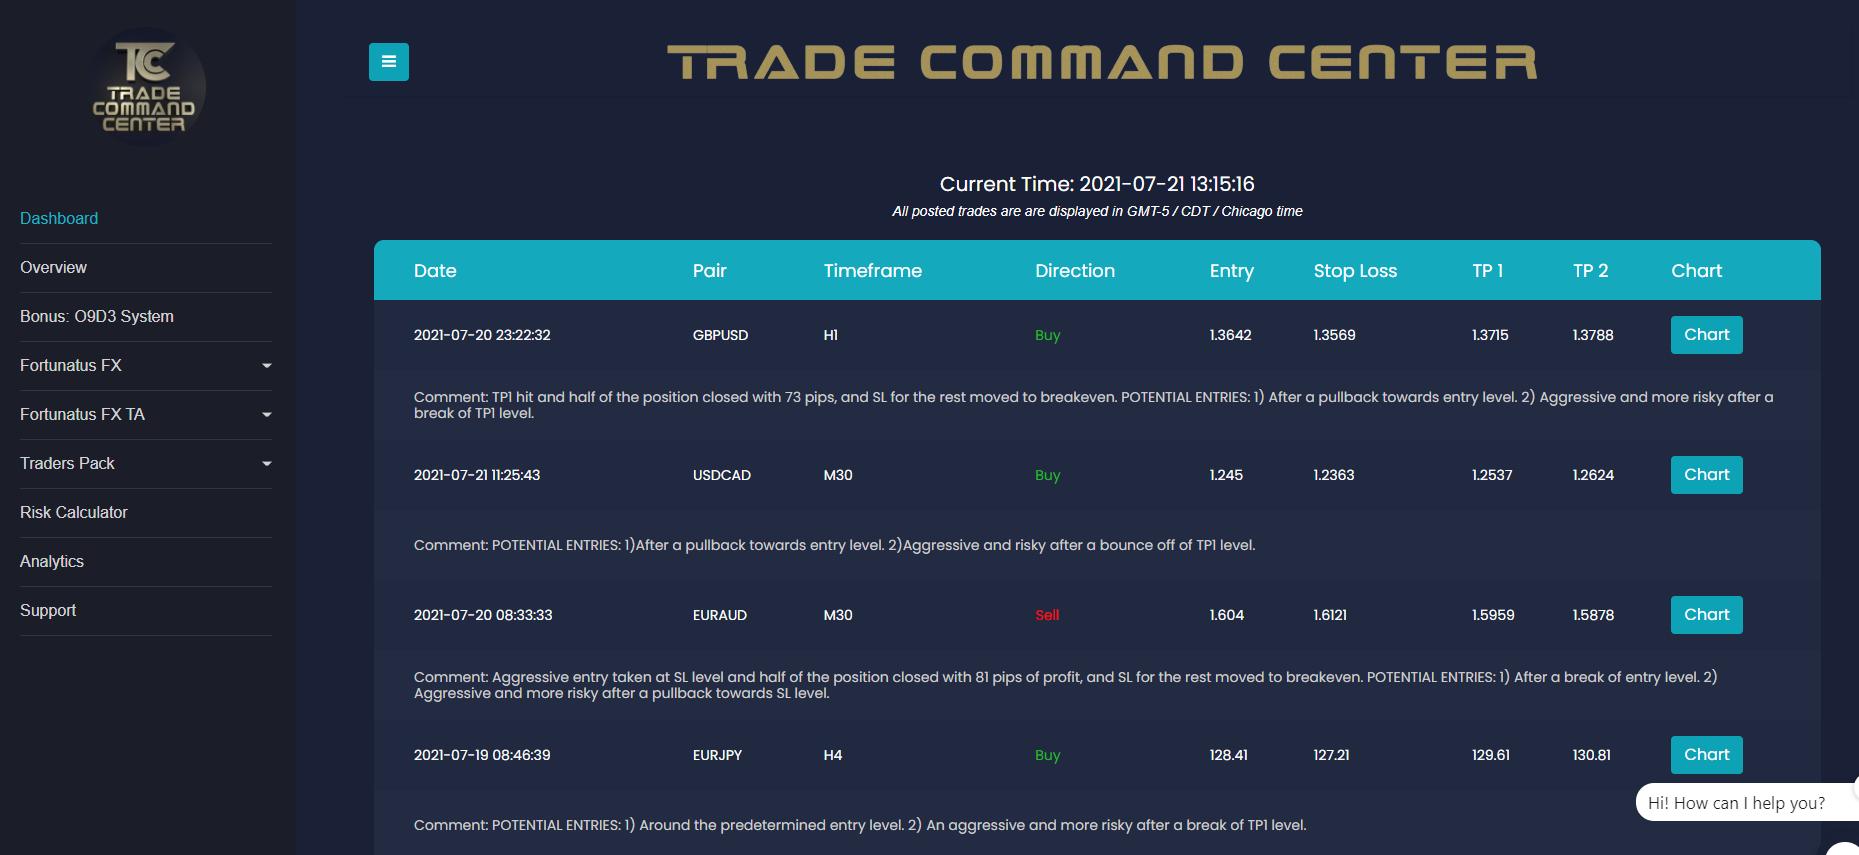 Trade Command Center dashboard